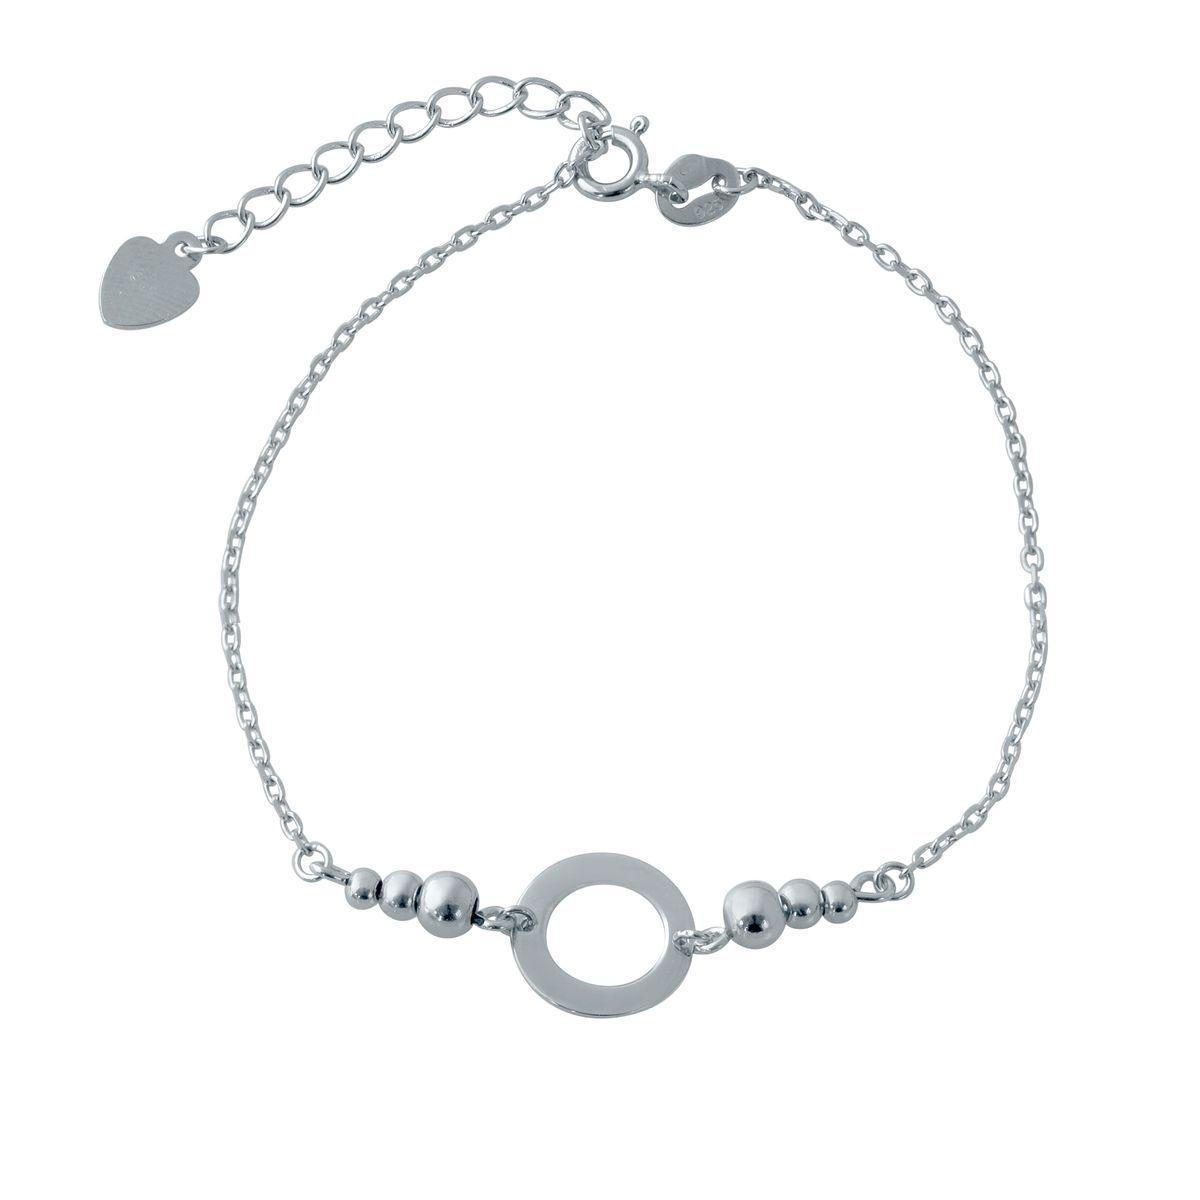 Серебряный браслет DreamJewelry без камней (2014423) 1720 размер